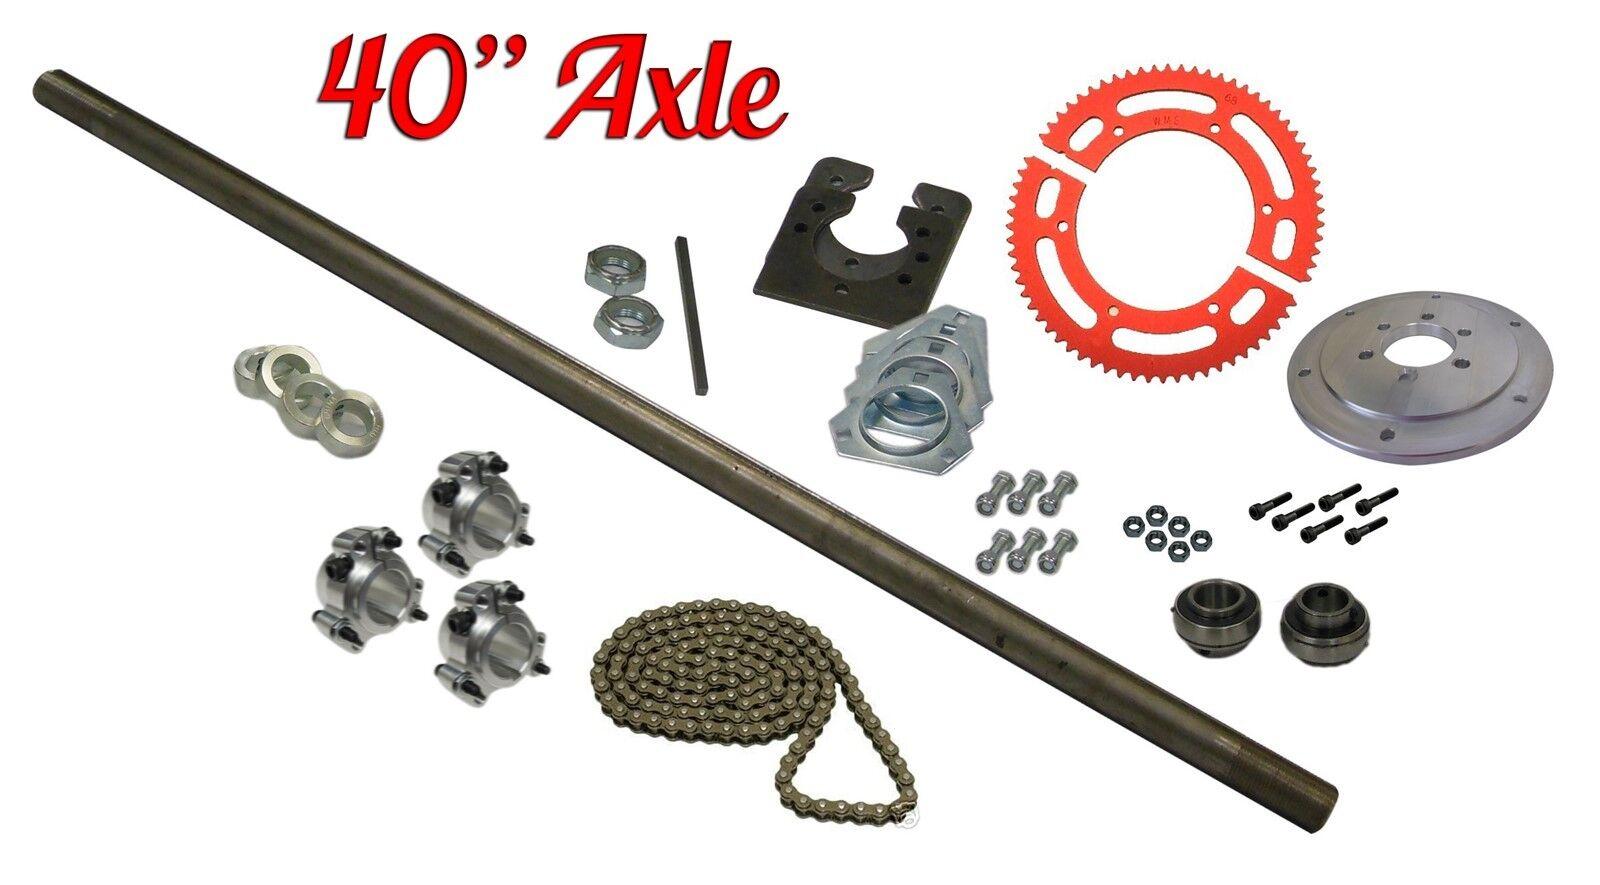 Drift Trike 1  x 40  Live Axle Kit w Hubs Bearings Flangettes Chain Hardware